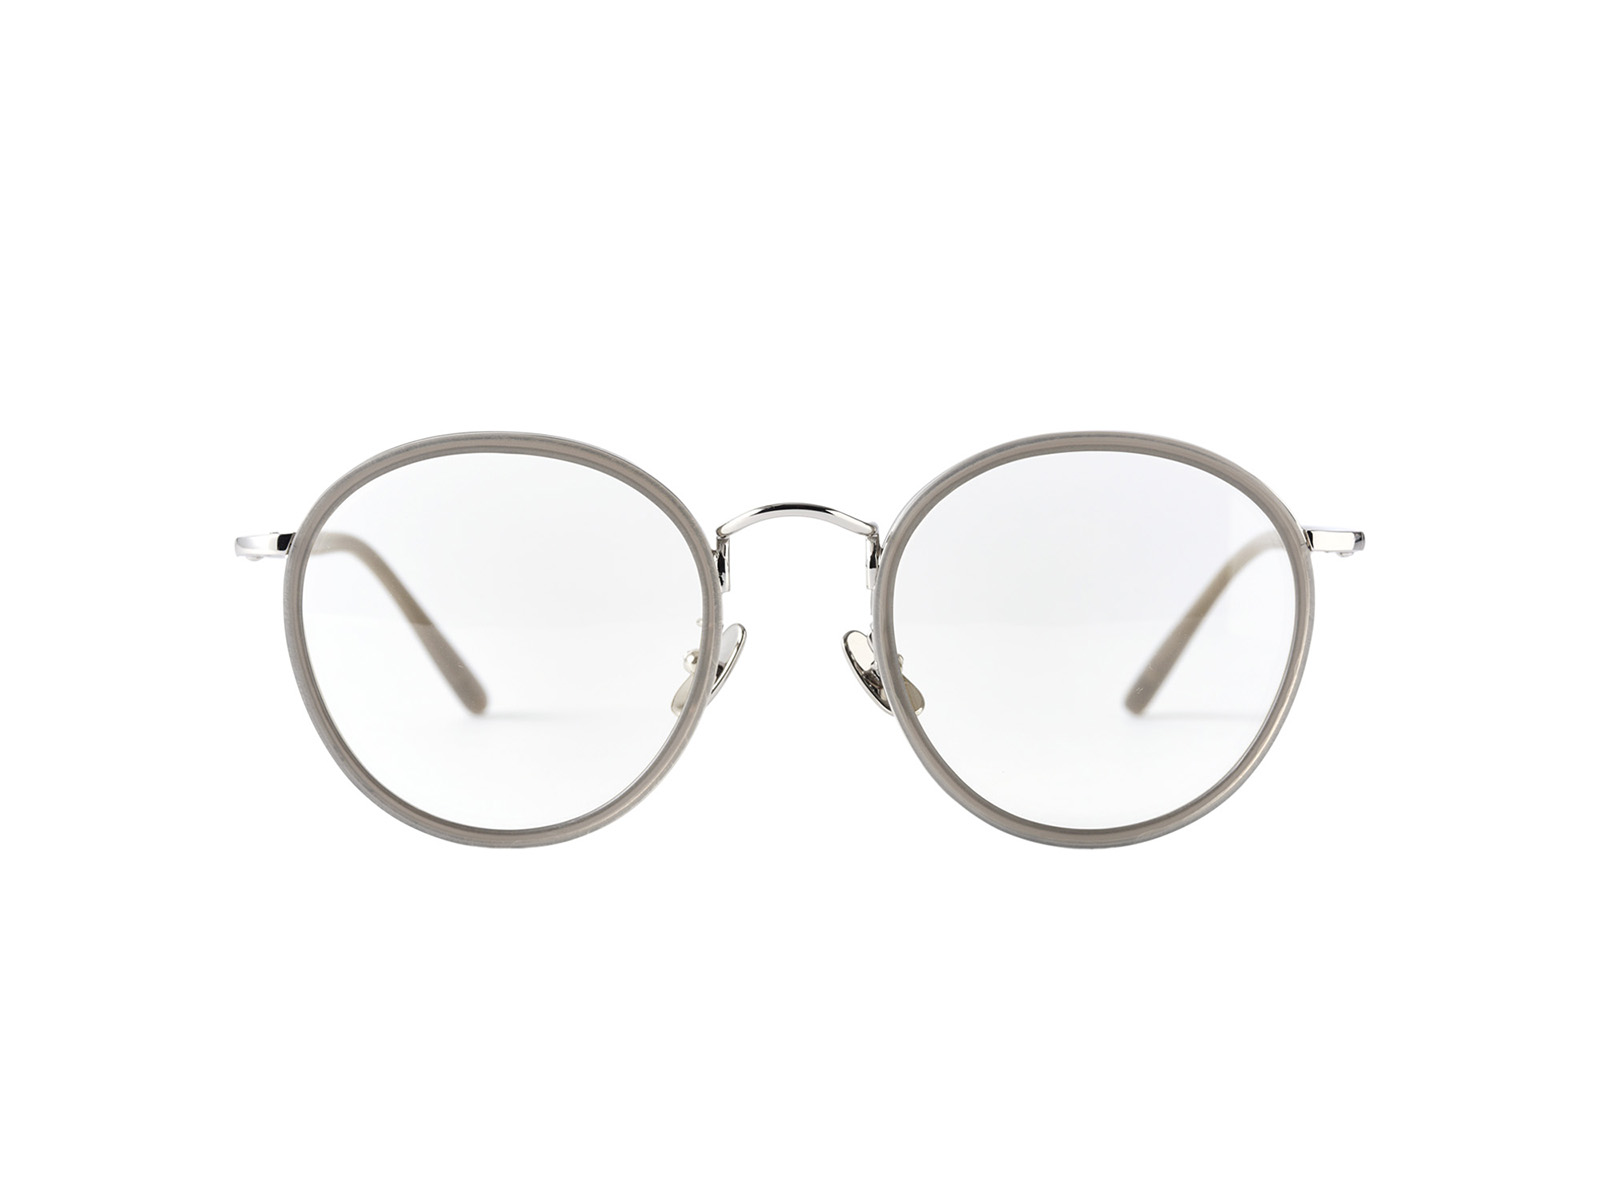 A.D.S.R. EVANS【エーディーエスアール エヴァンス サングラス】 【ファッショングッズ】【アイウェア】【眼鏡】【メガネ】【小物】【雑貨】